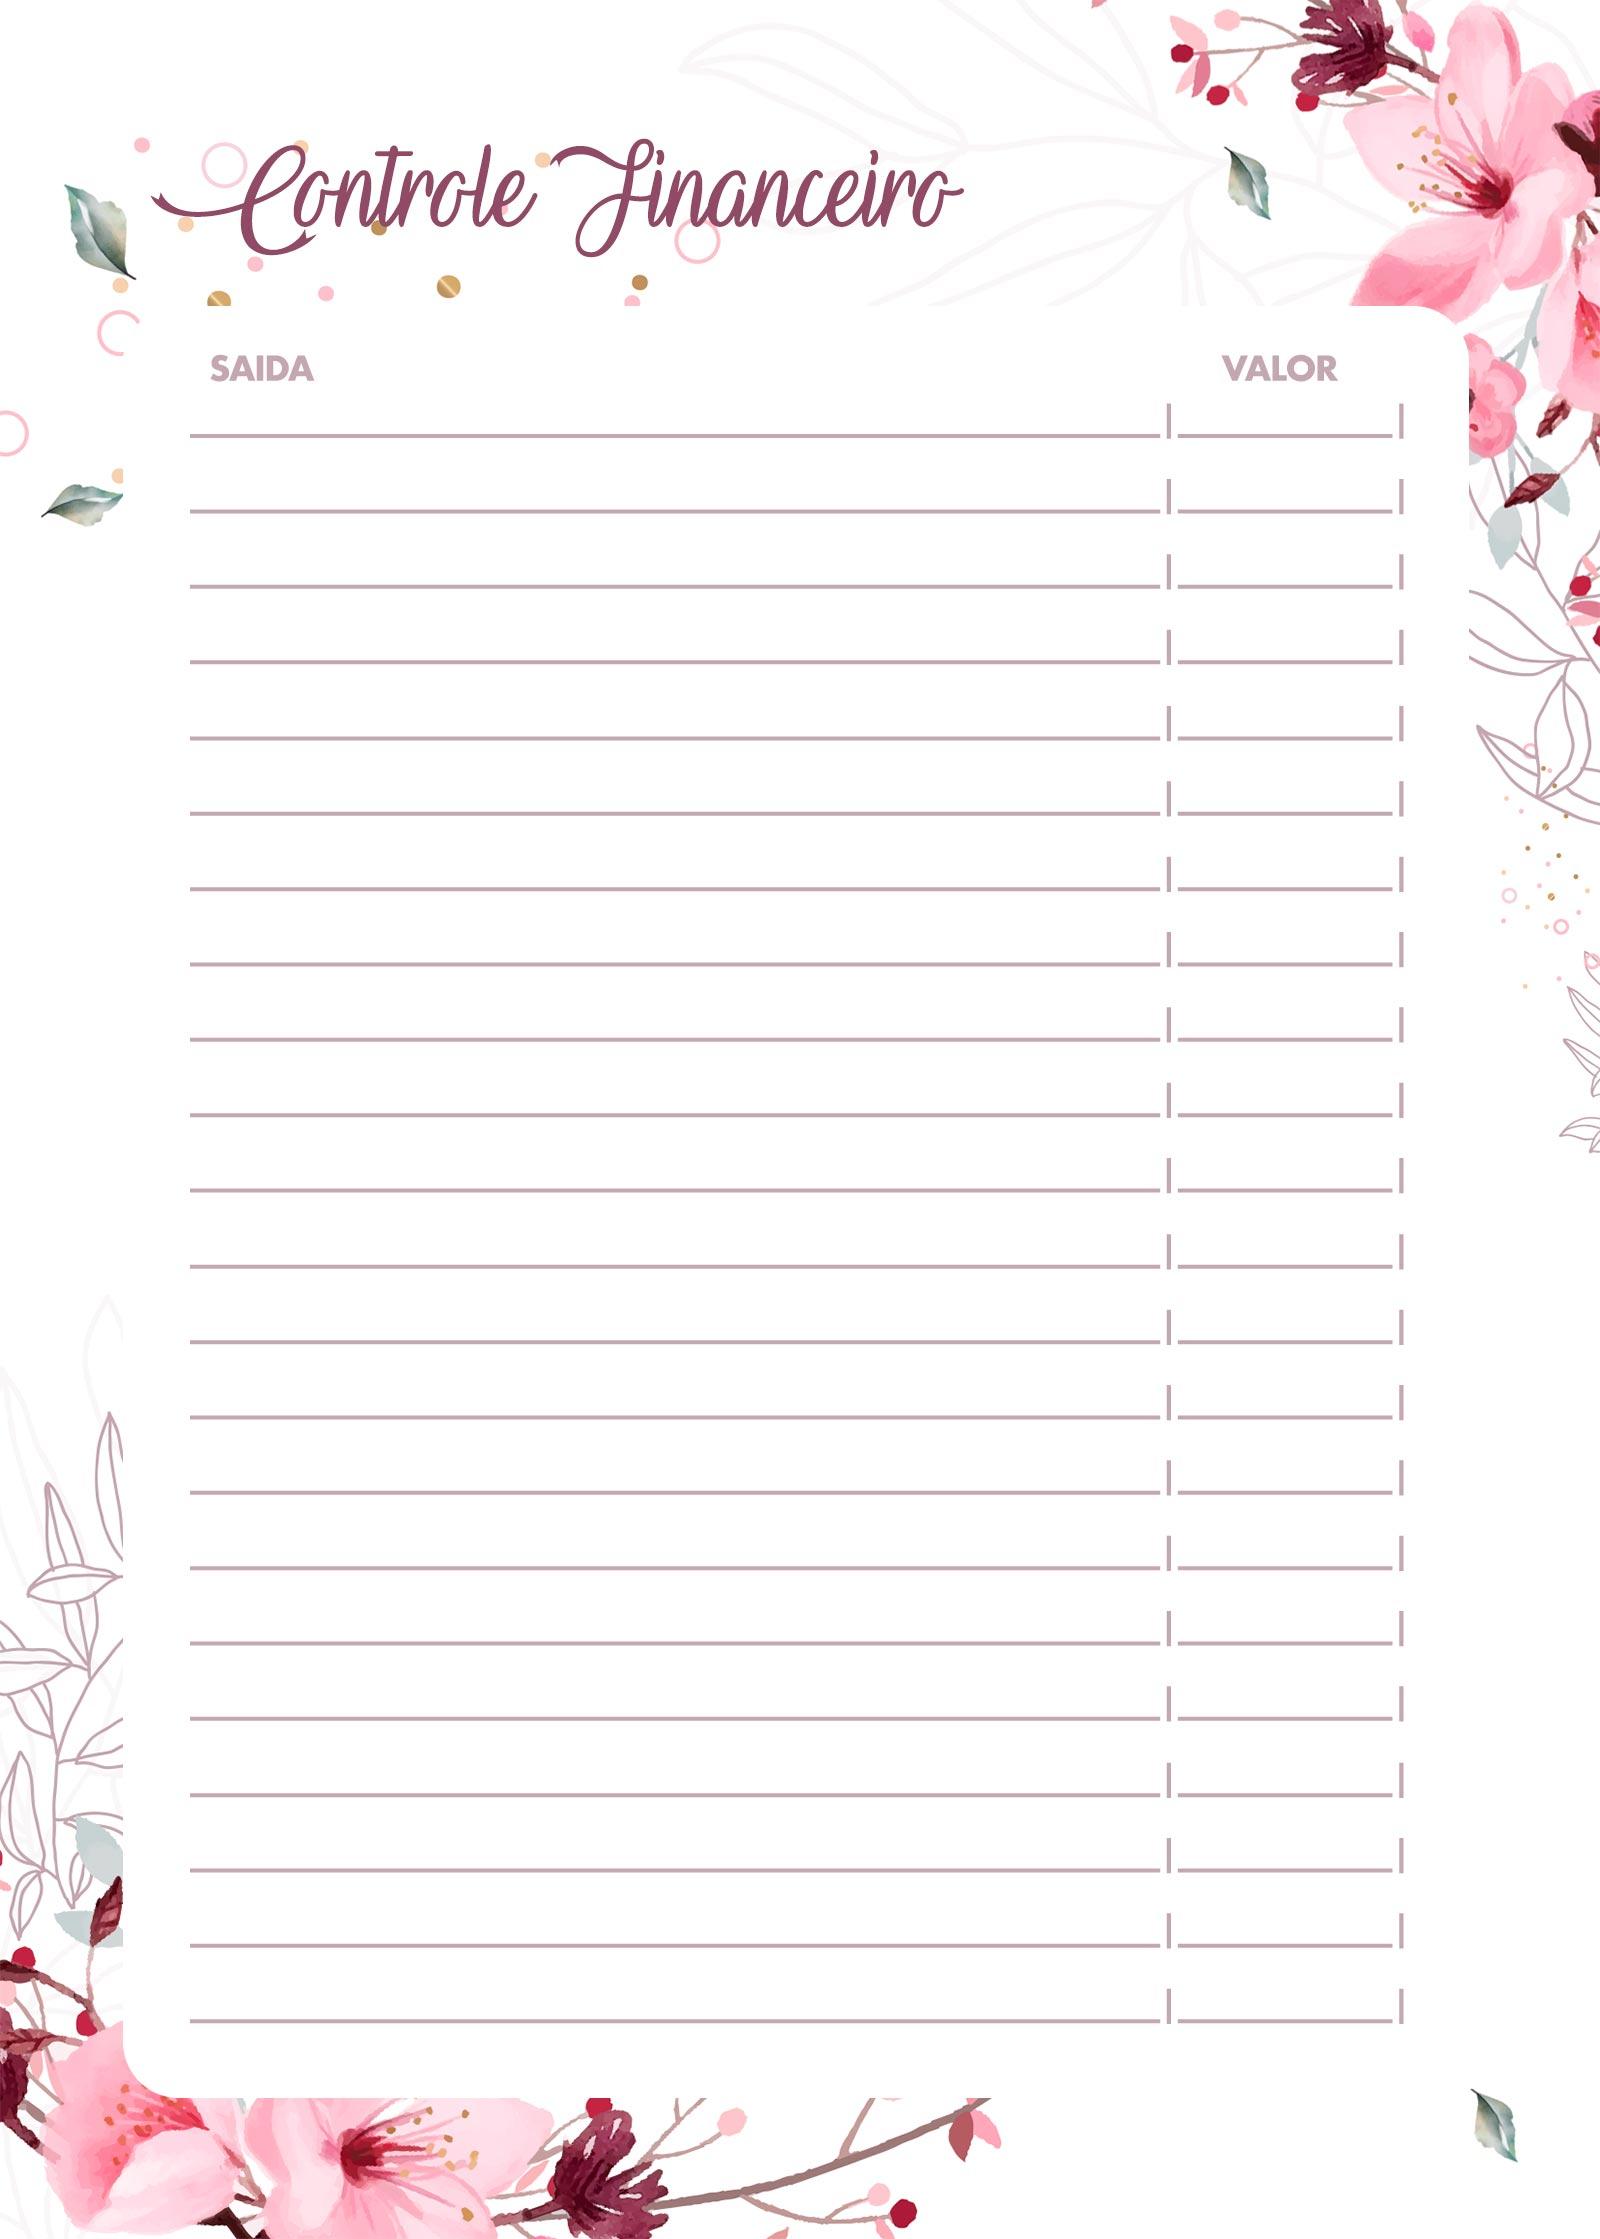 Planner Floral controle financeiro